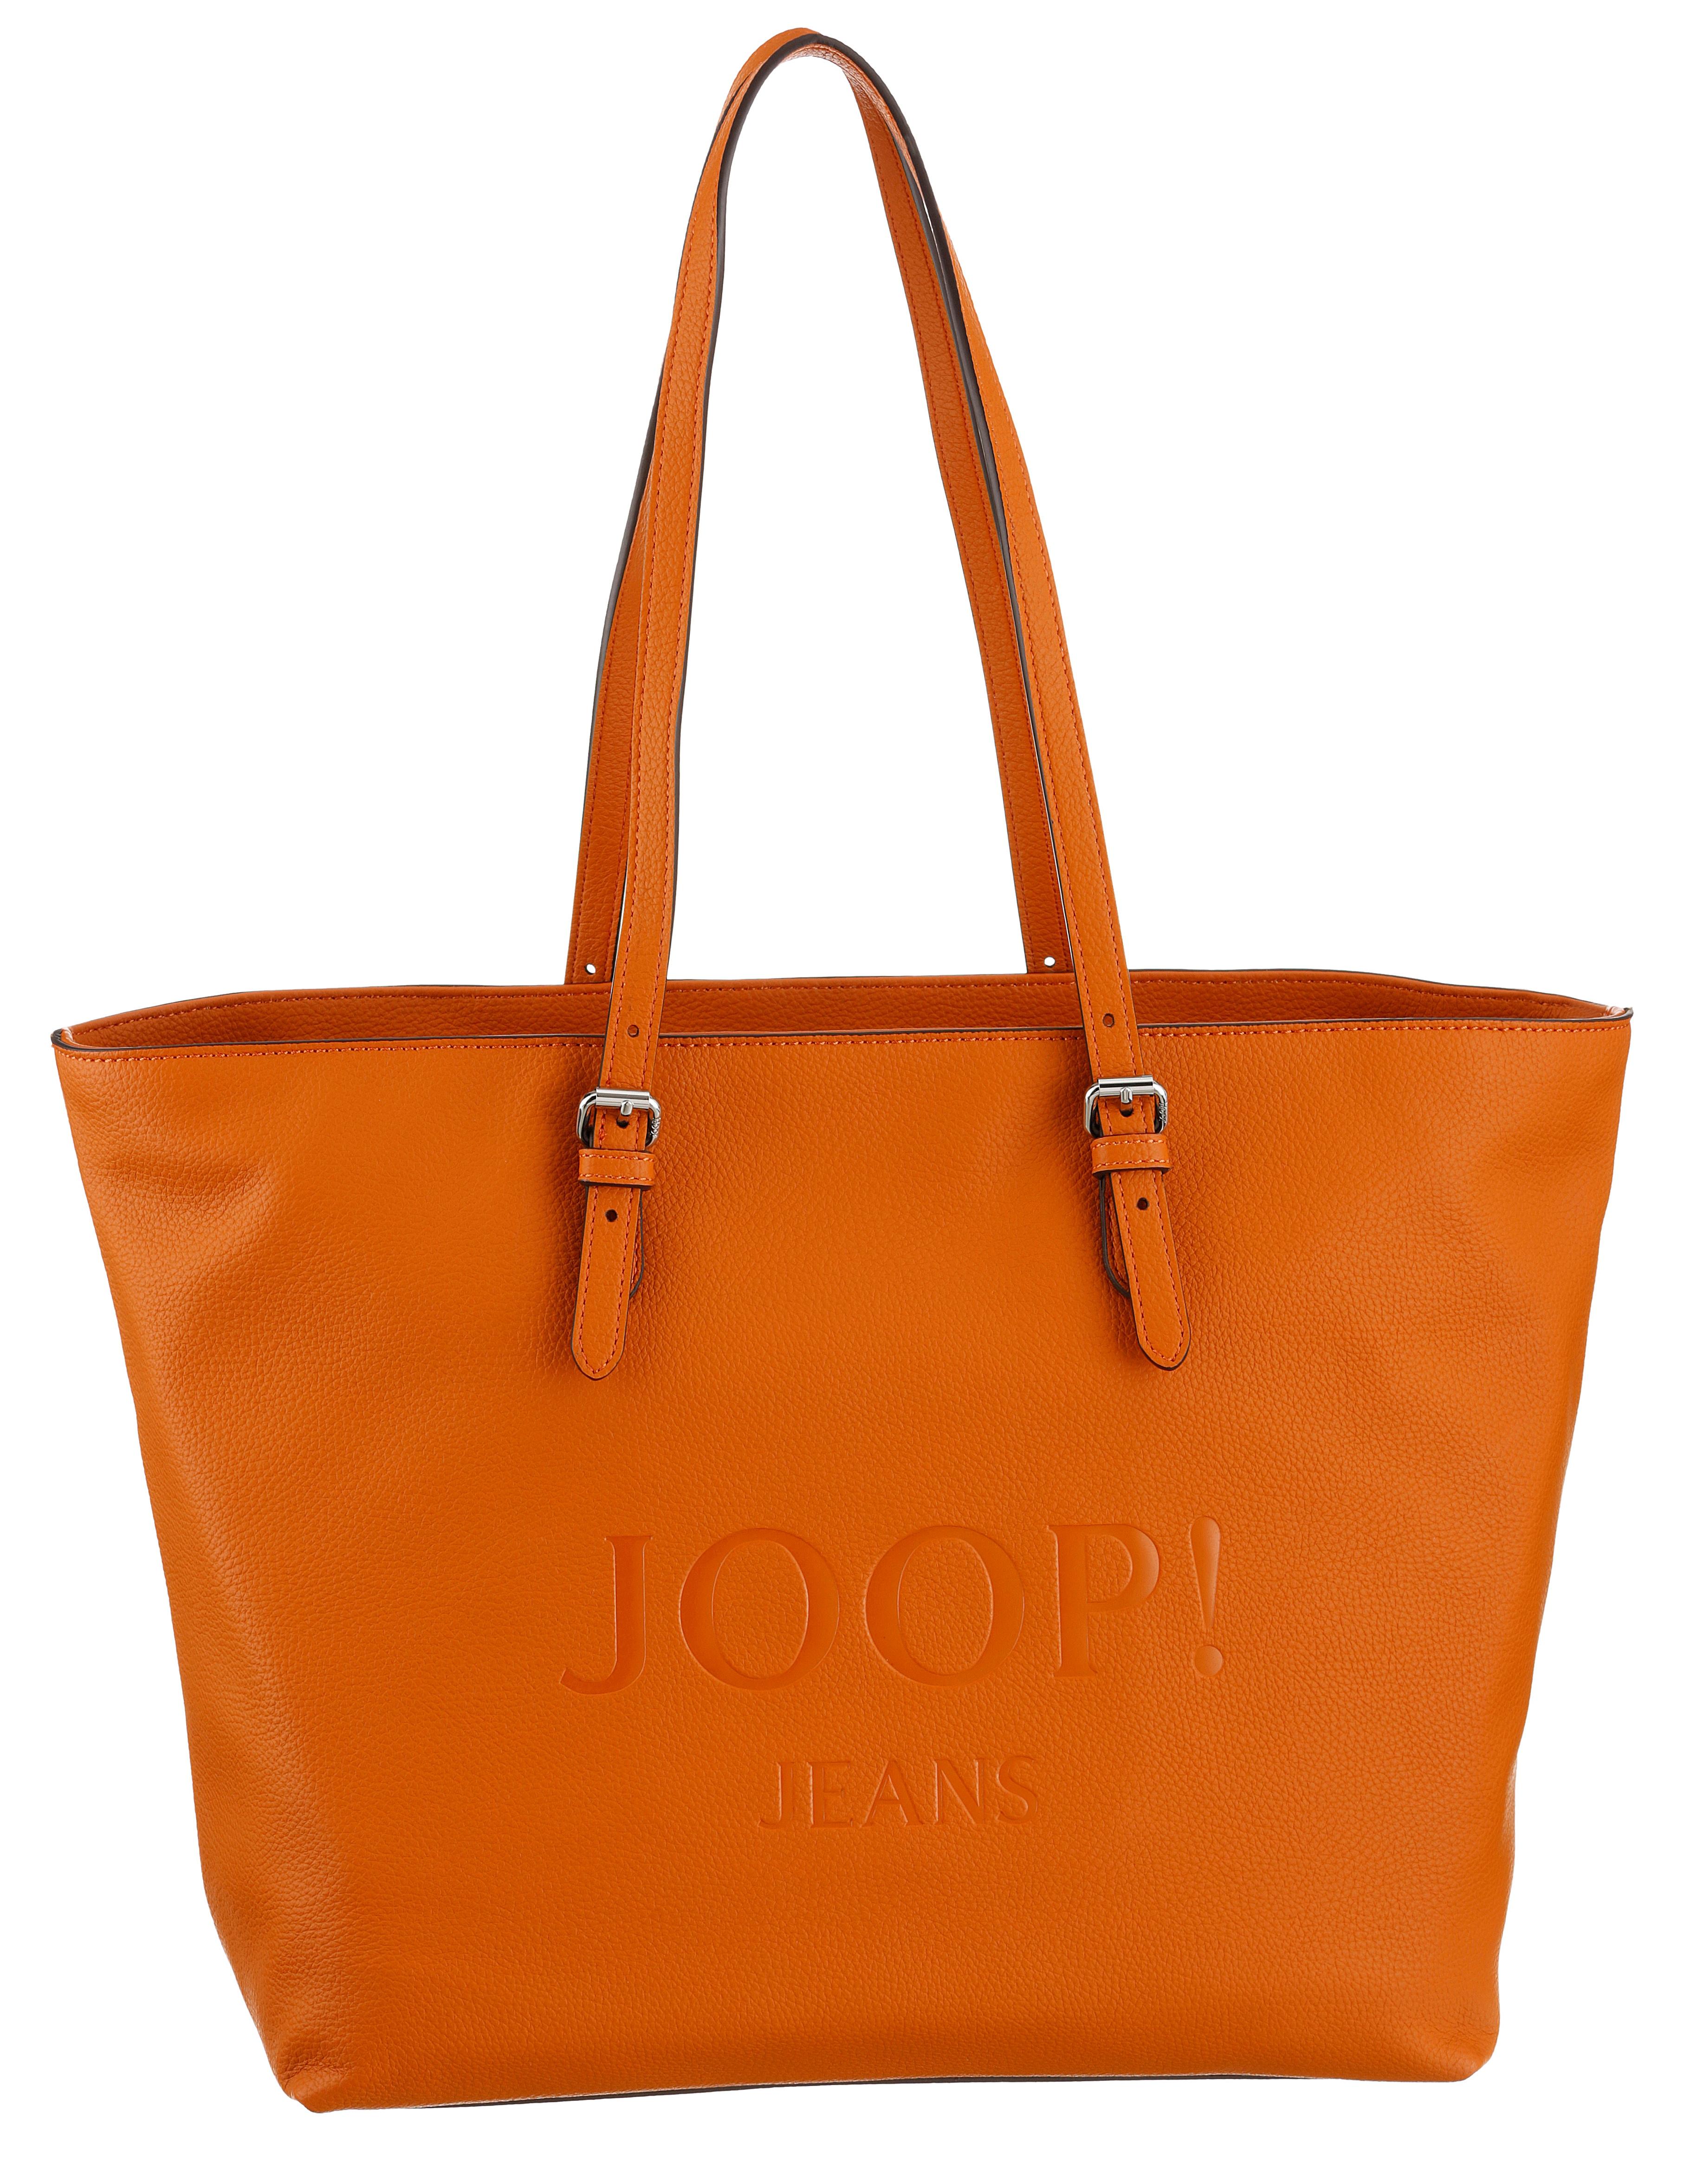 joop jeans -  Shopper Lettera Lara, mit Logoprägung